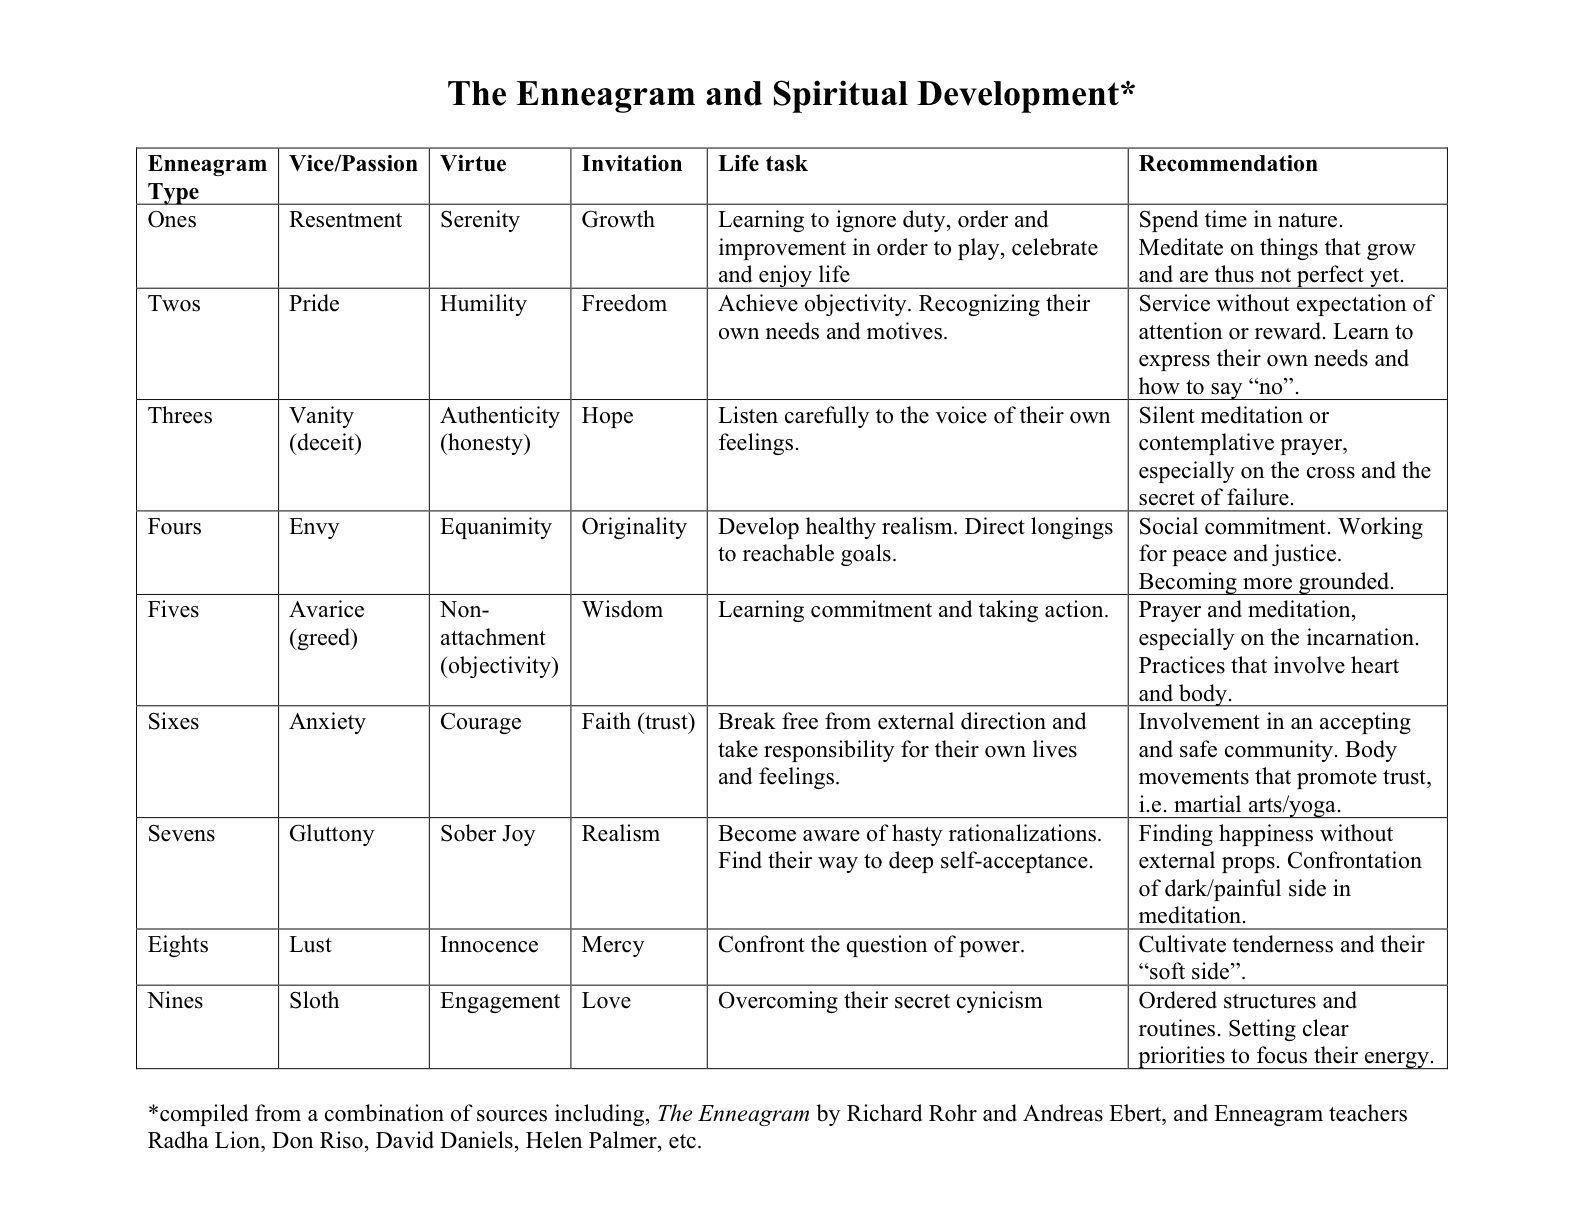 The Enneagram And Spiritual Growth